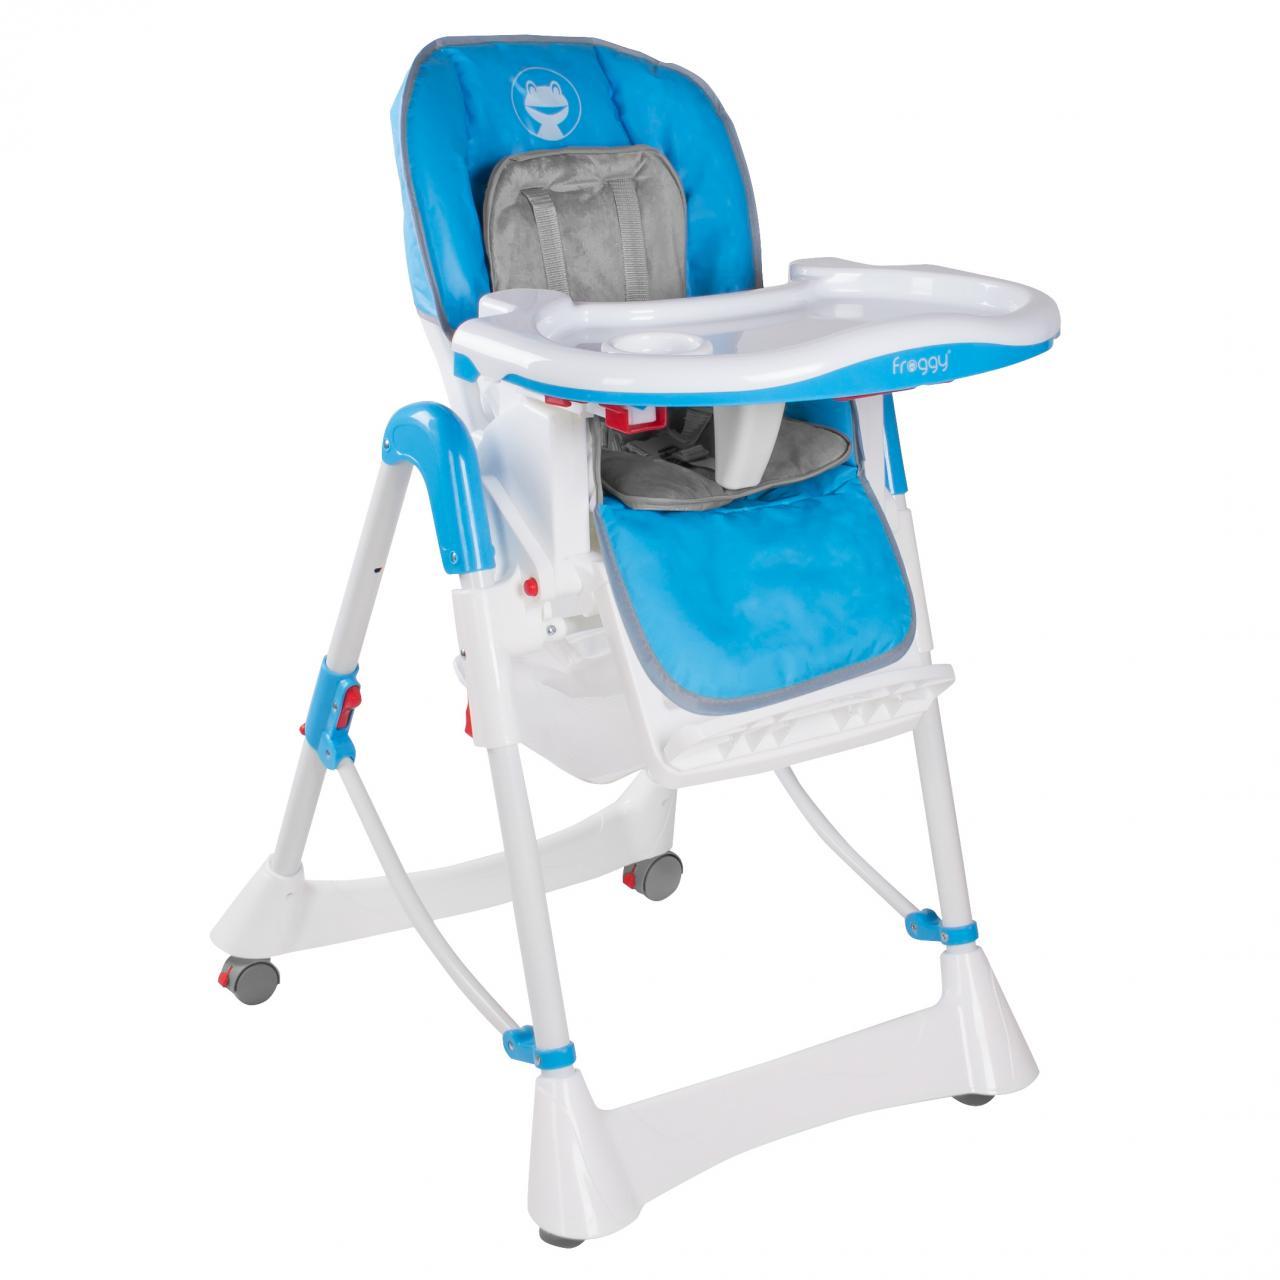 froggy kinderstuhl hochstuhl babystuhl verstellbar klappbar 3 sitzpositionen ebay. Black Bedroom Furniture Sets. Home Design Ideas